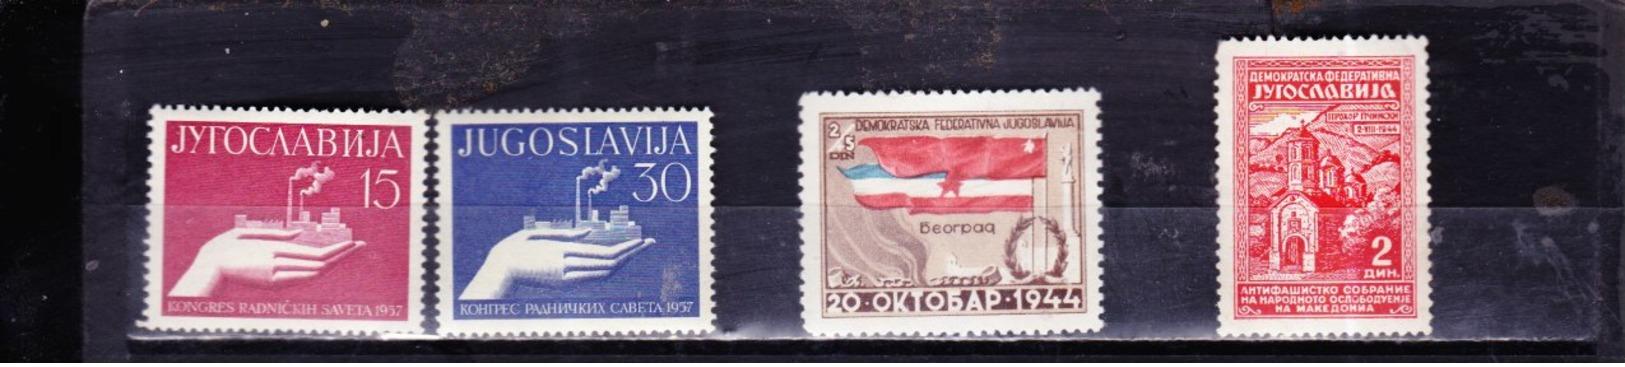 Yugoslavia  821 - 822 469  456     ** - Unused Stamps